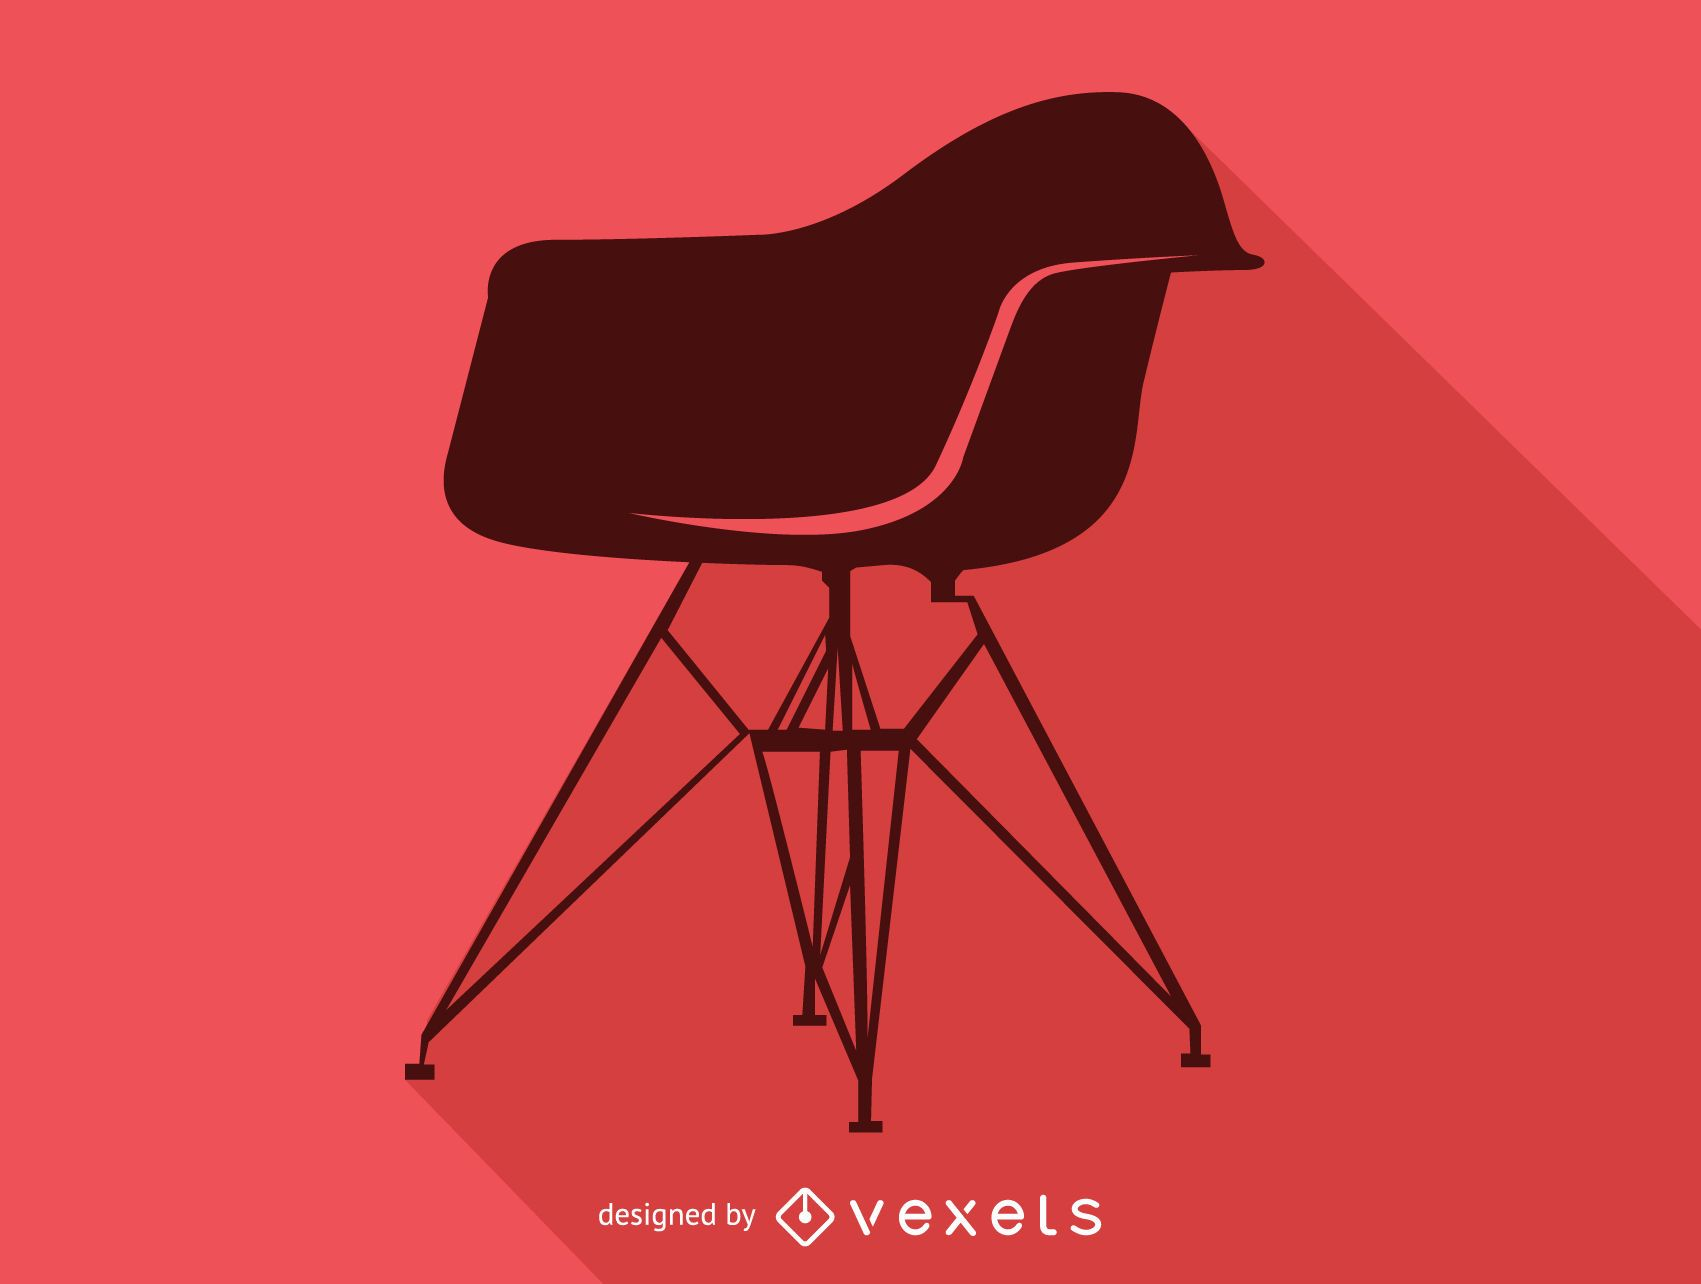 Silla Charles Ray Eames silueta